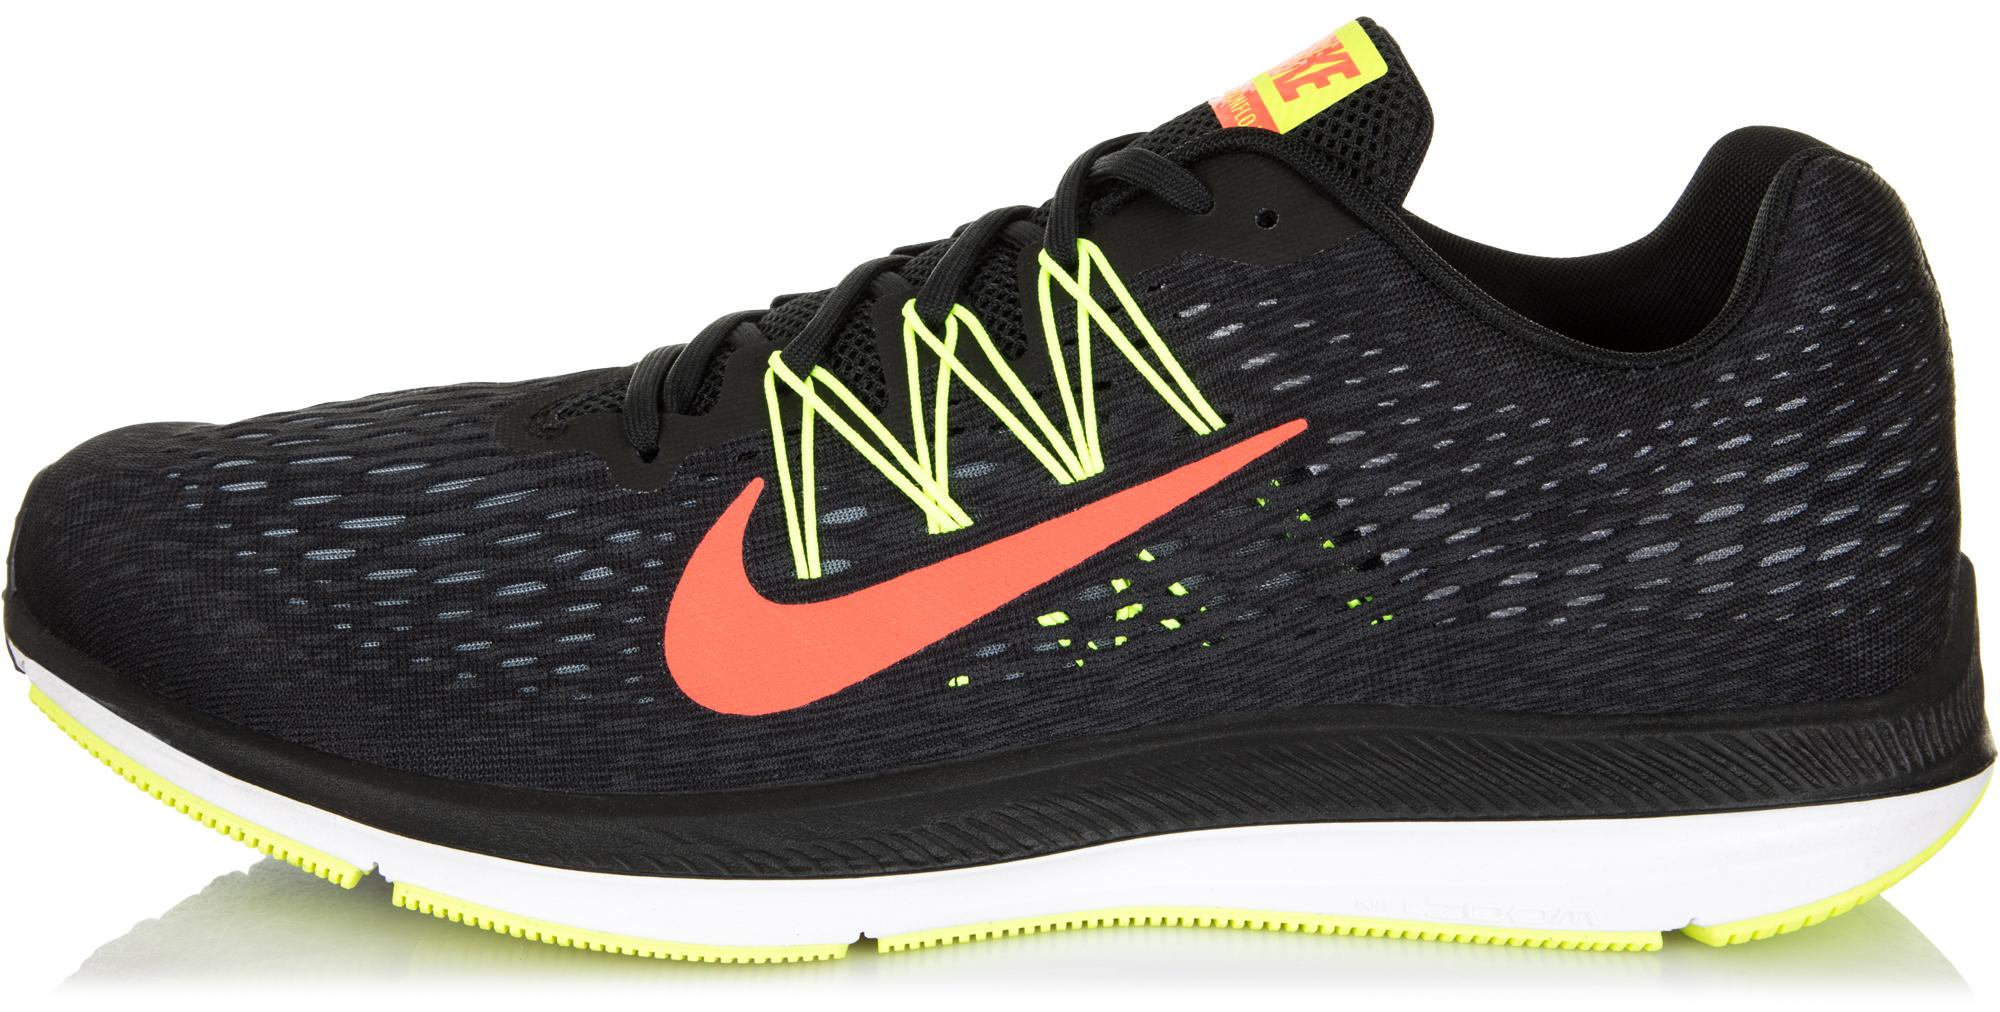 Nike Кроссовки мужские Nike Air Zoom Winflo 5, размер 44 кроссовки для тенниса мужские nike court lite цвет белый 845021 100 размер 10 5 43 5